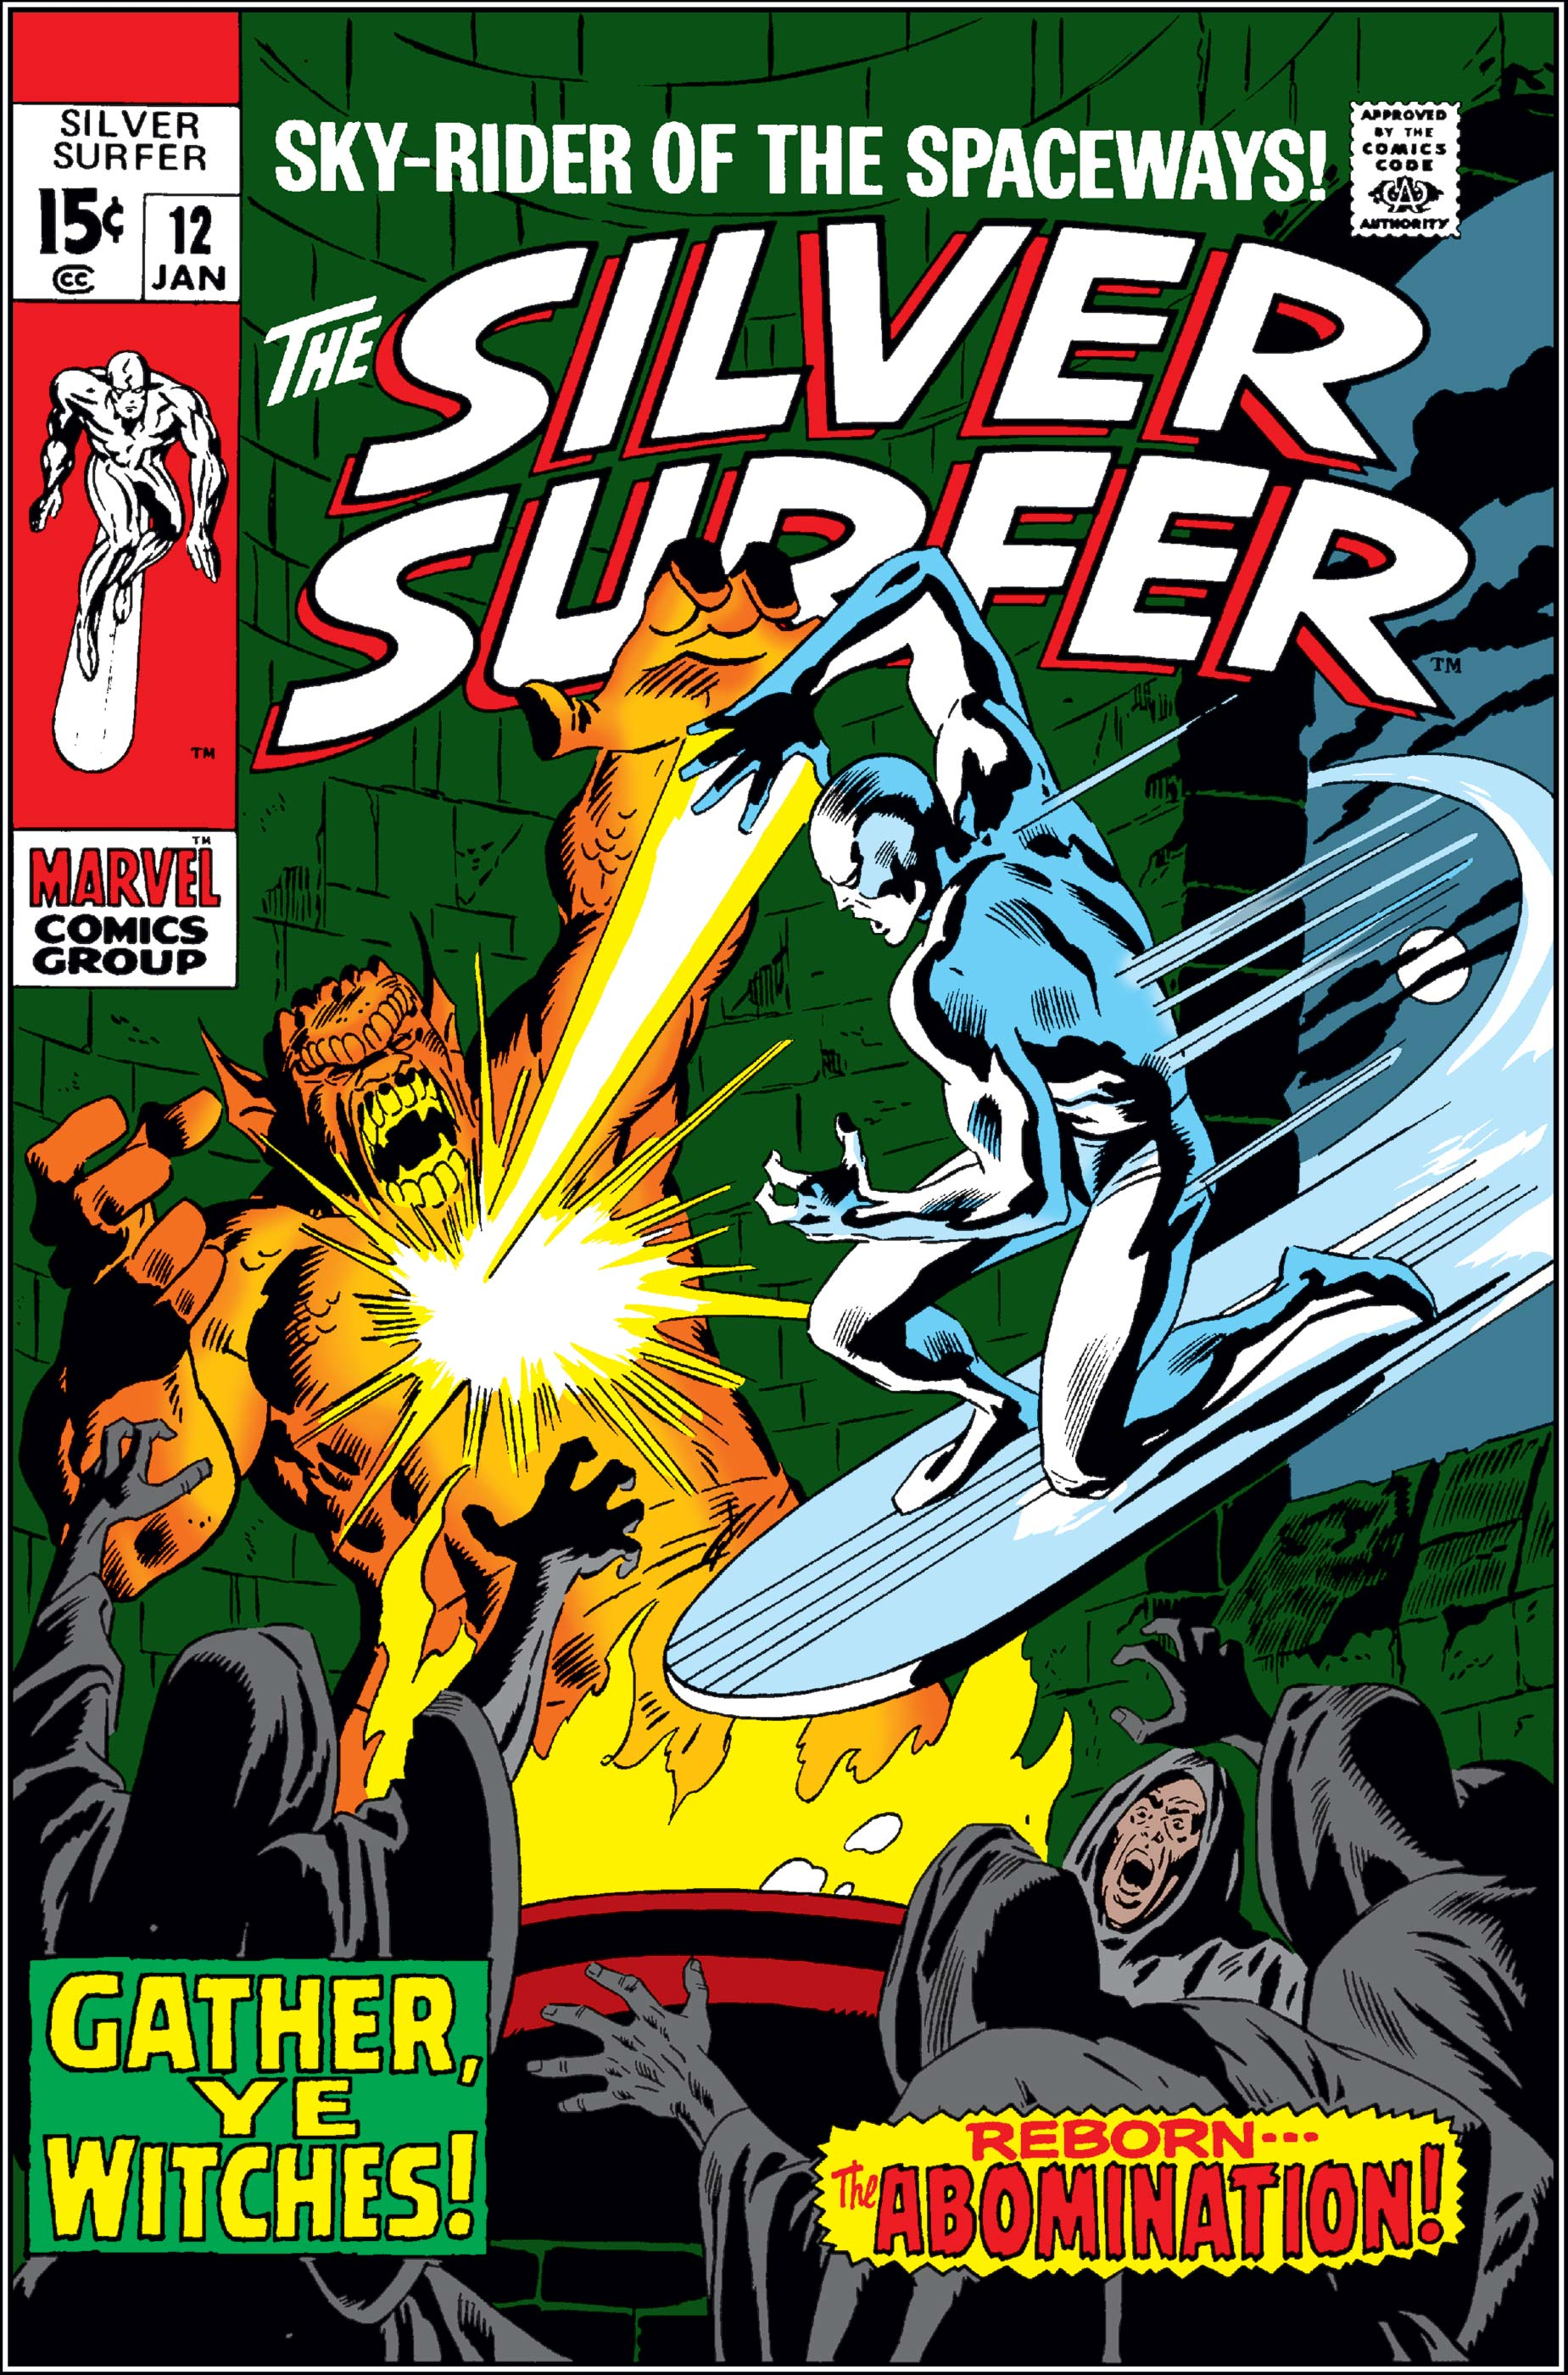 Silver Surfer (1968) #12